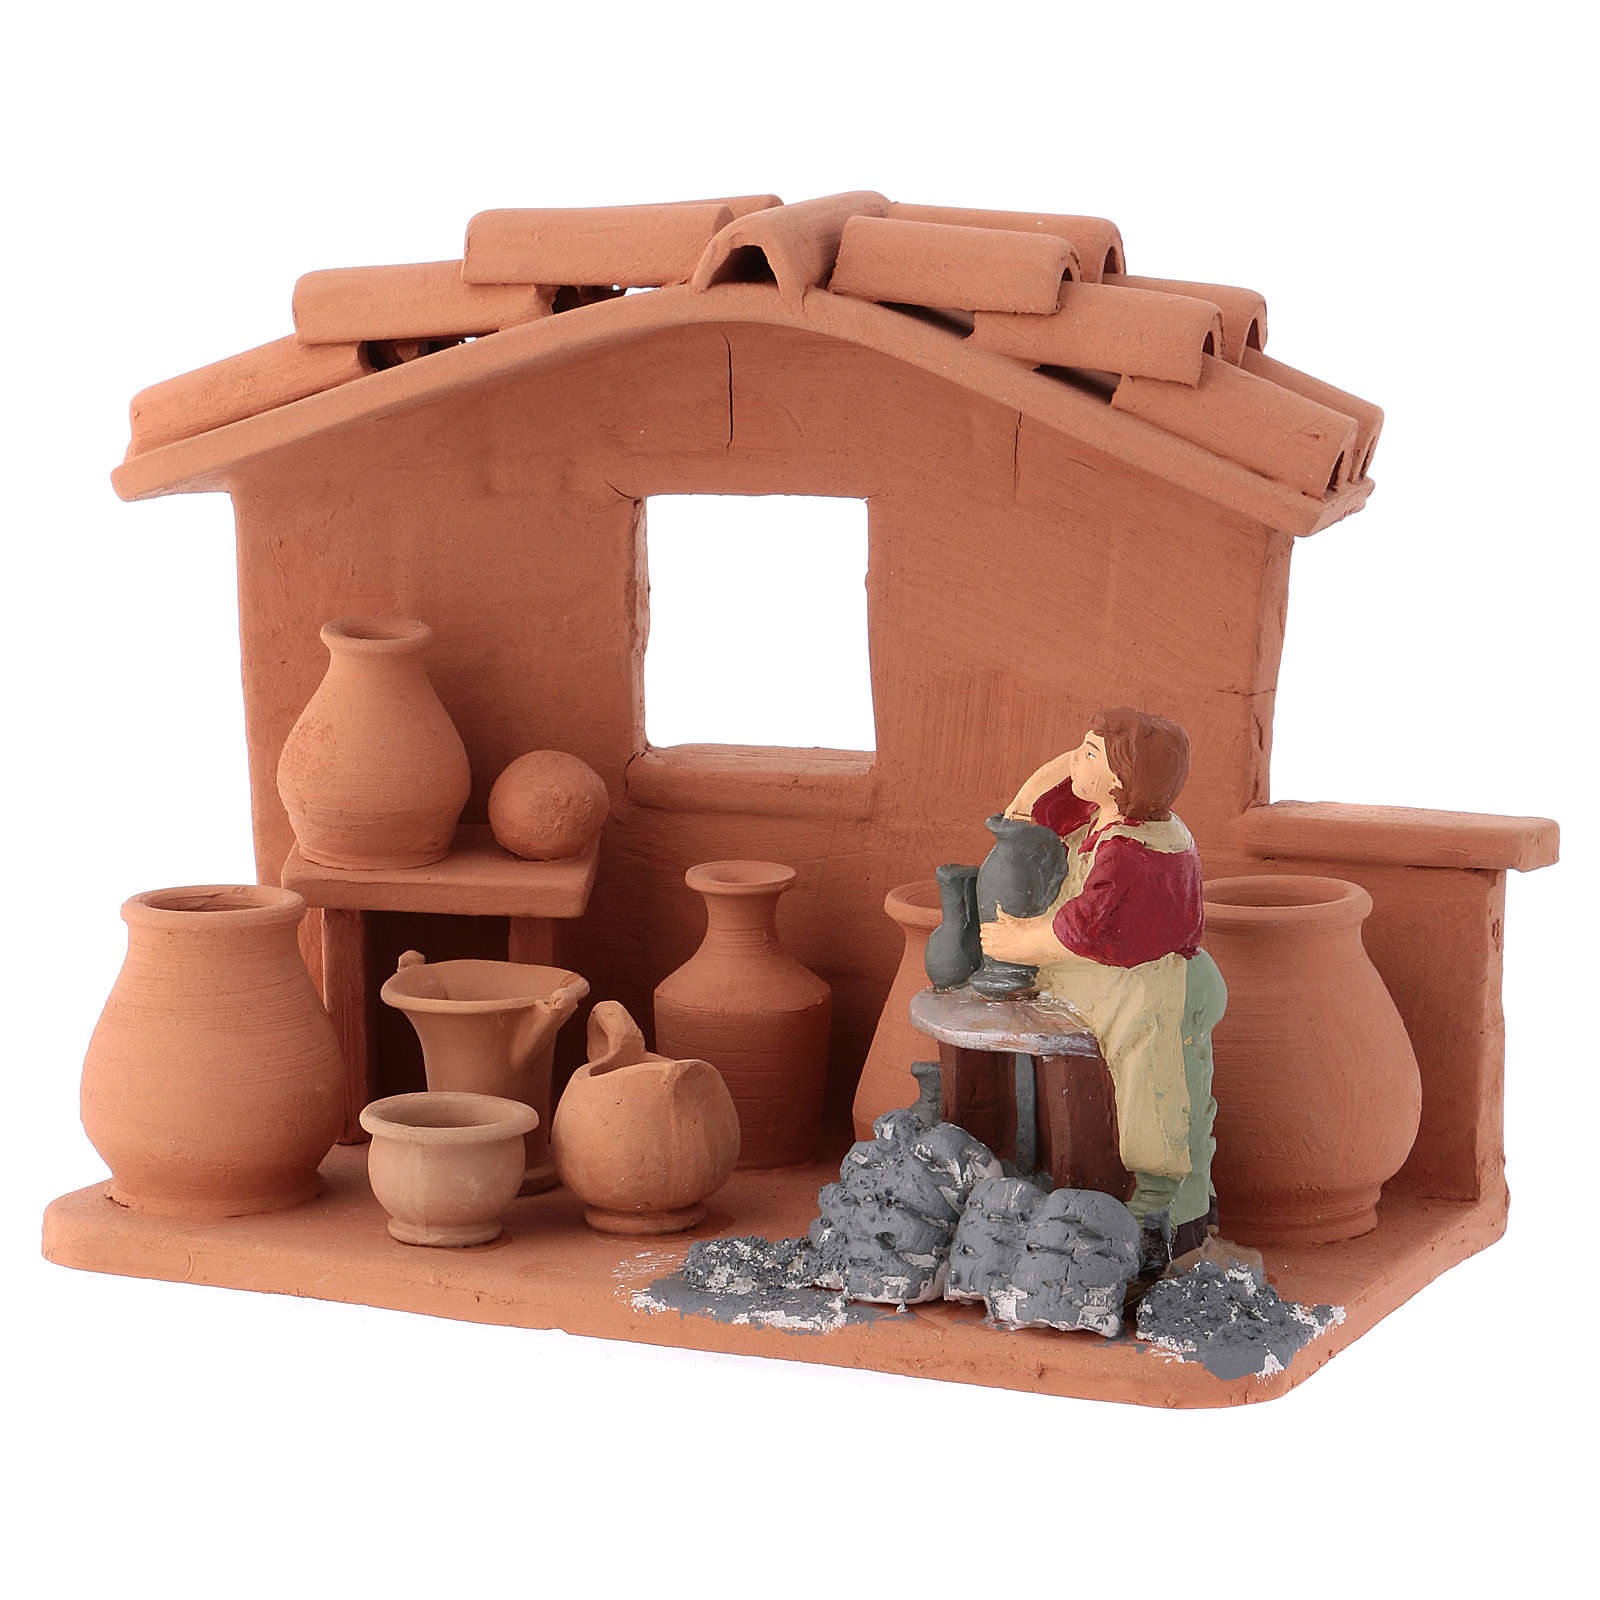 Man with lathe in Deruta terracotta handmade for Nativity scenes of 10 cm 4